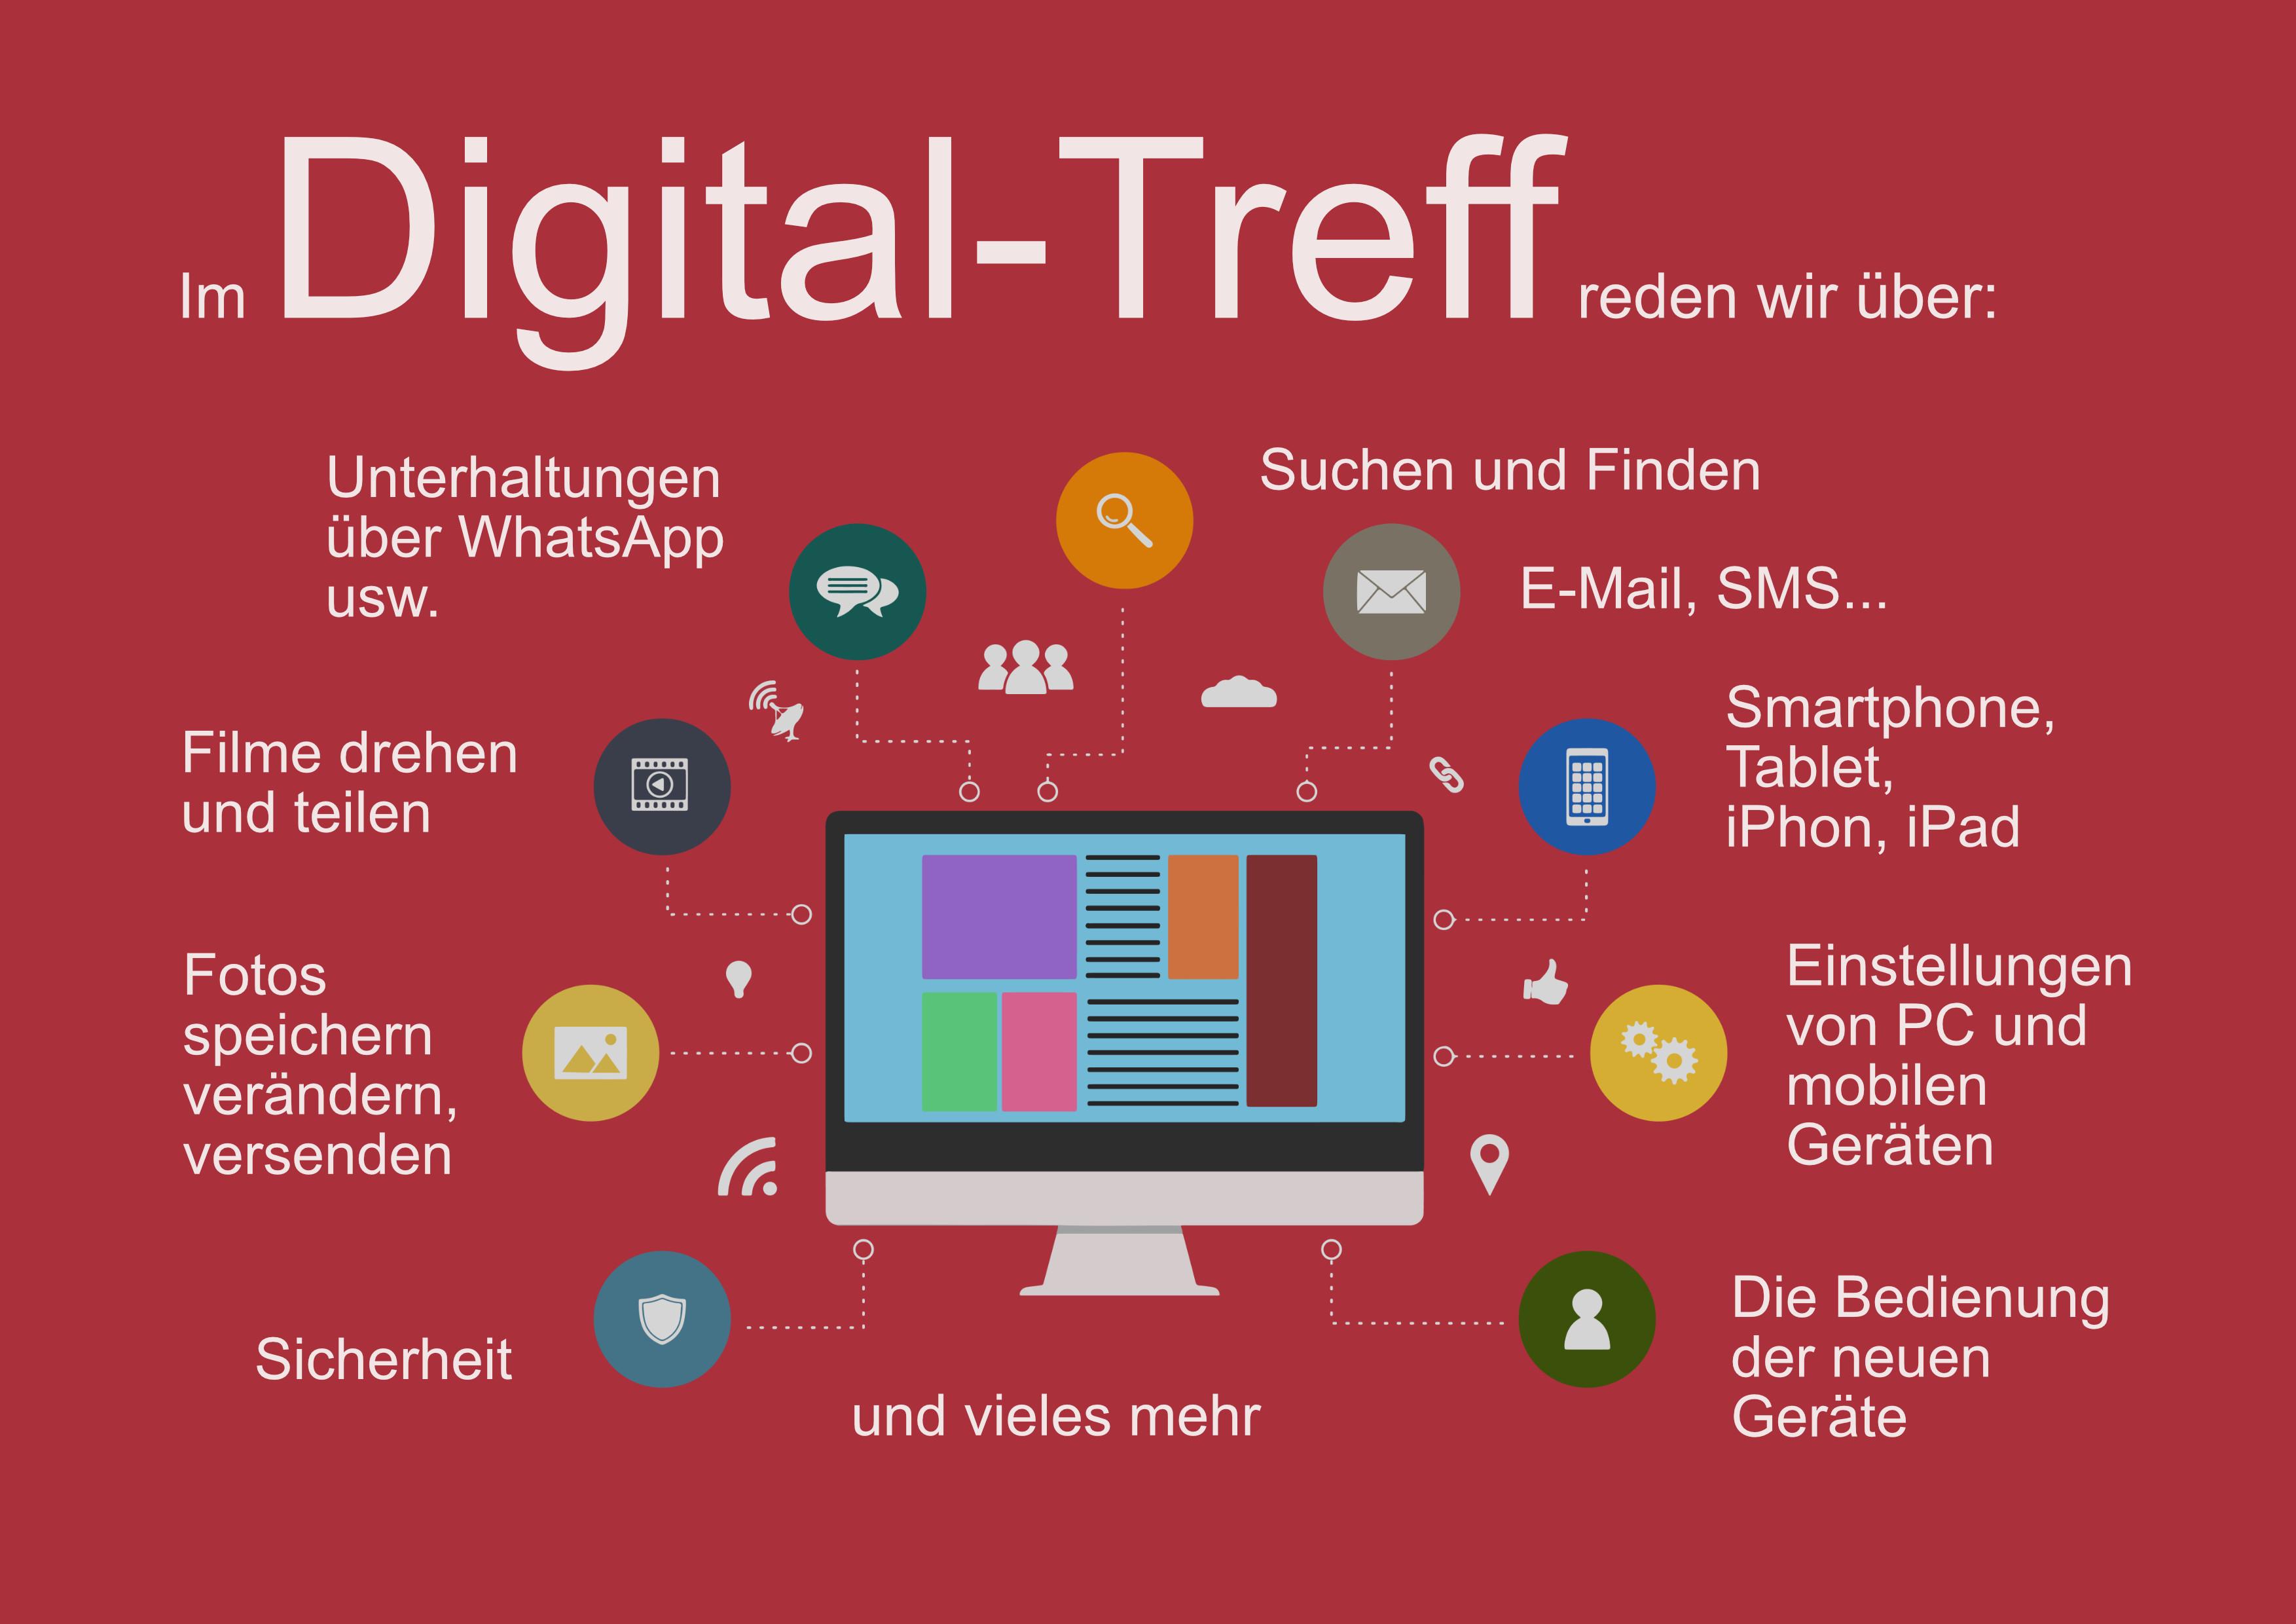 Digital-Treff